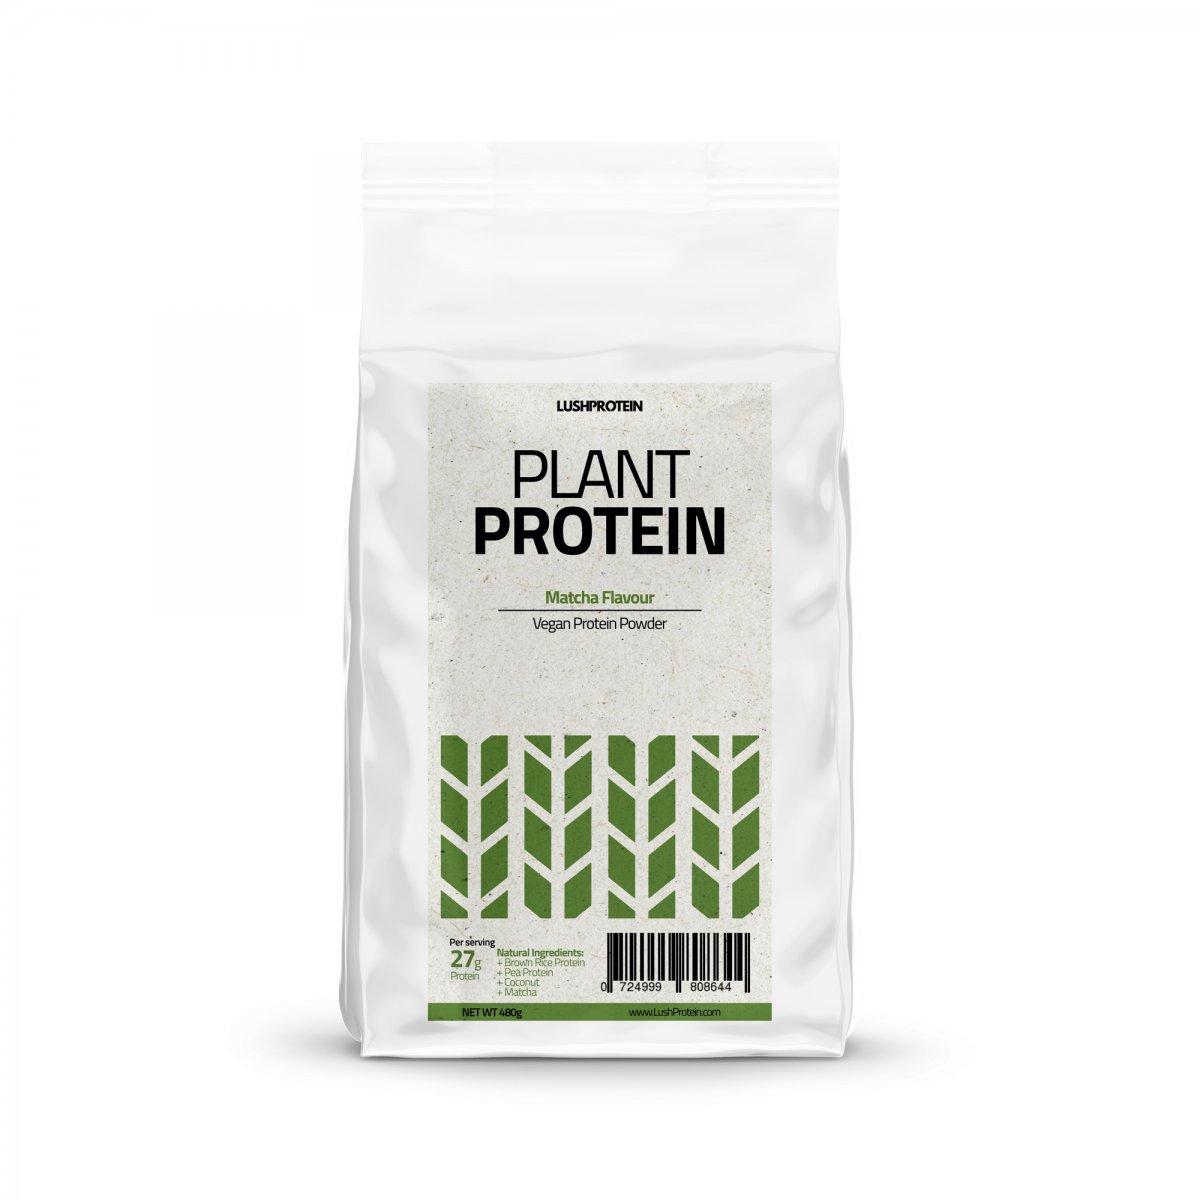 lush plant protein matcha